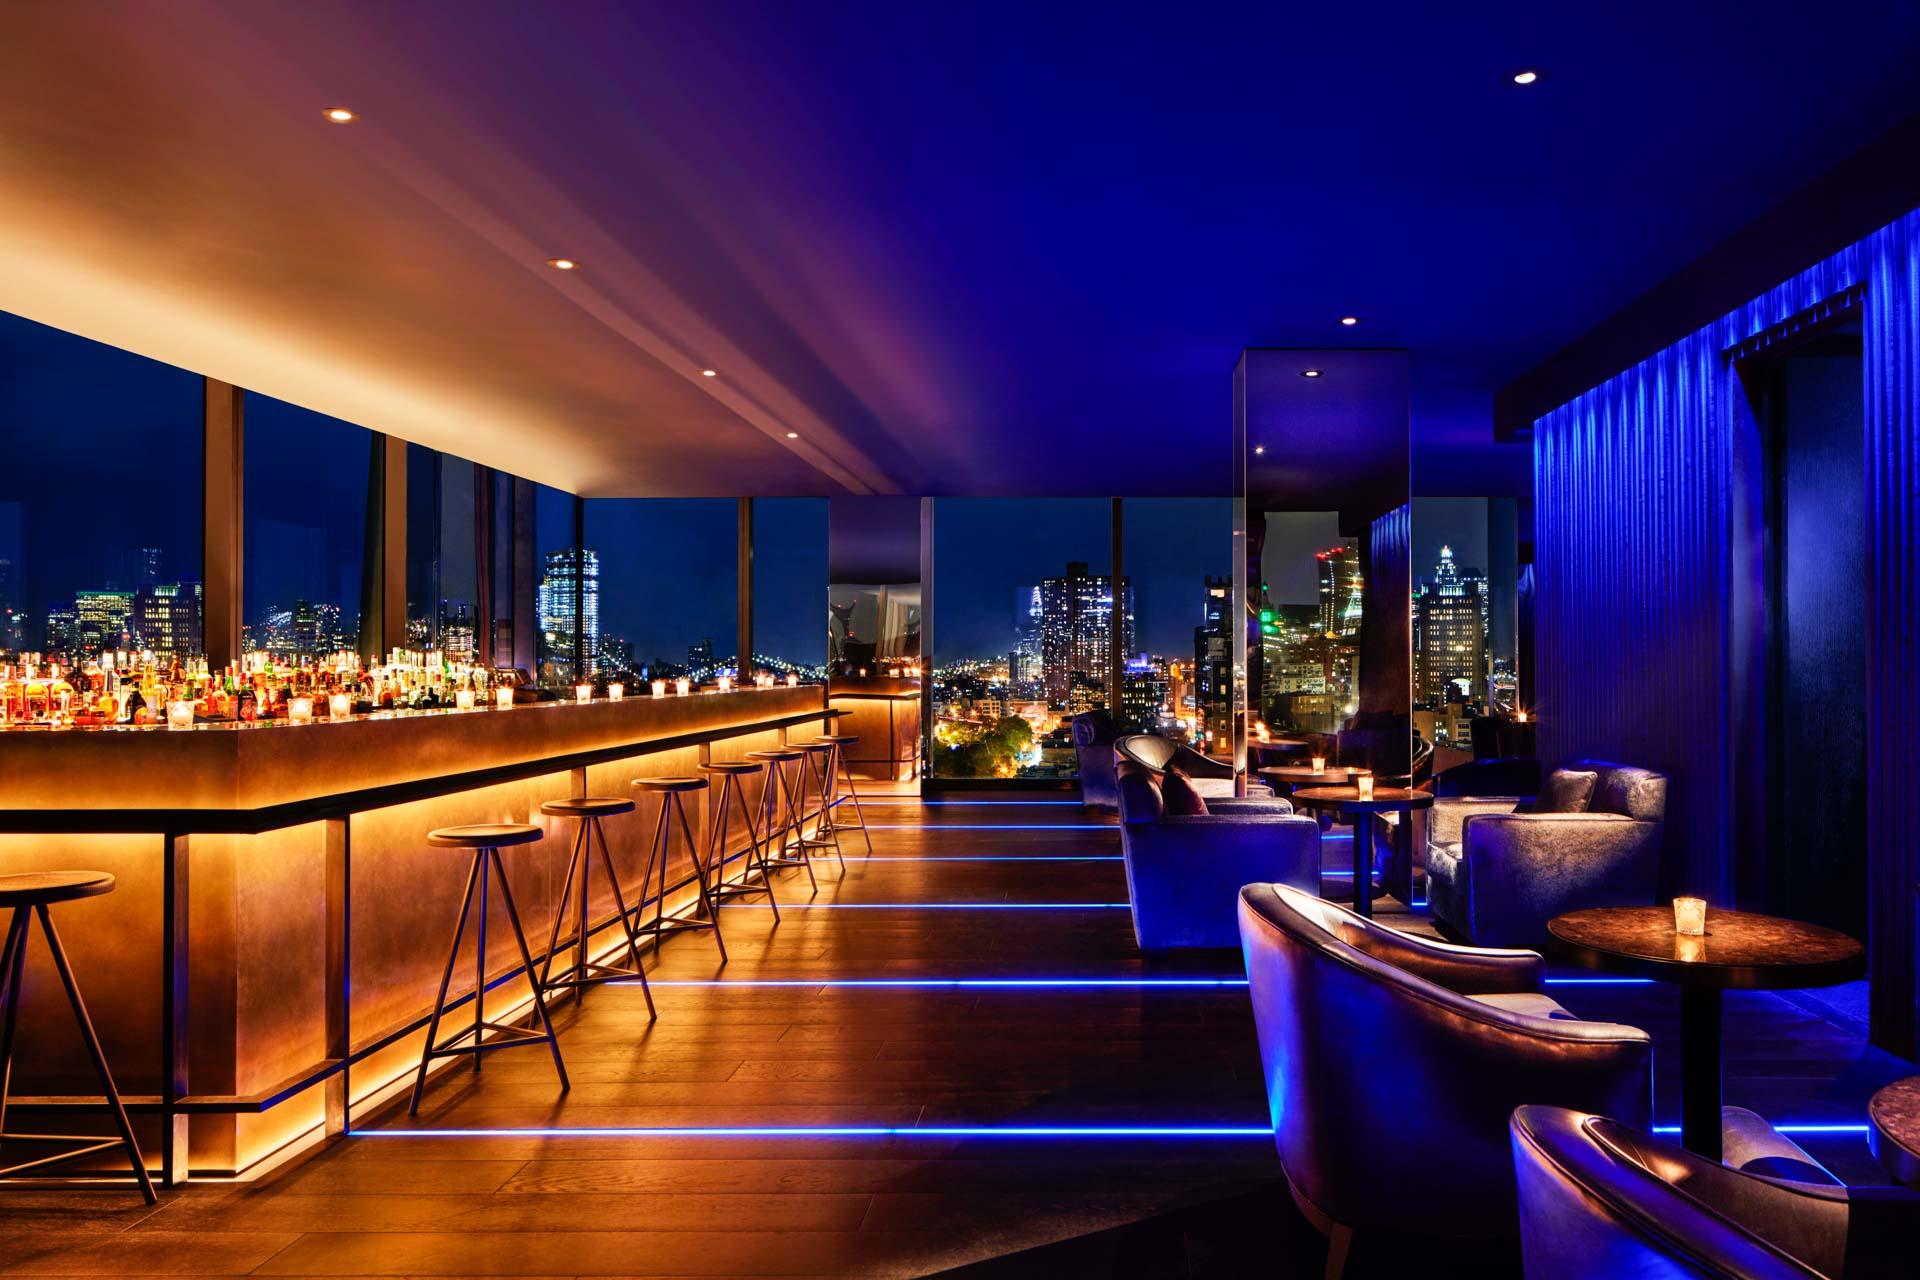 14-PUBLIC Hotel New York City - The Roof - © Nicholas Koenig.jpg